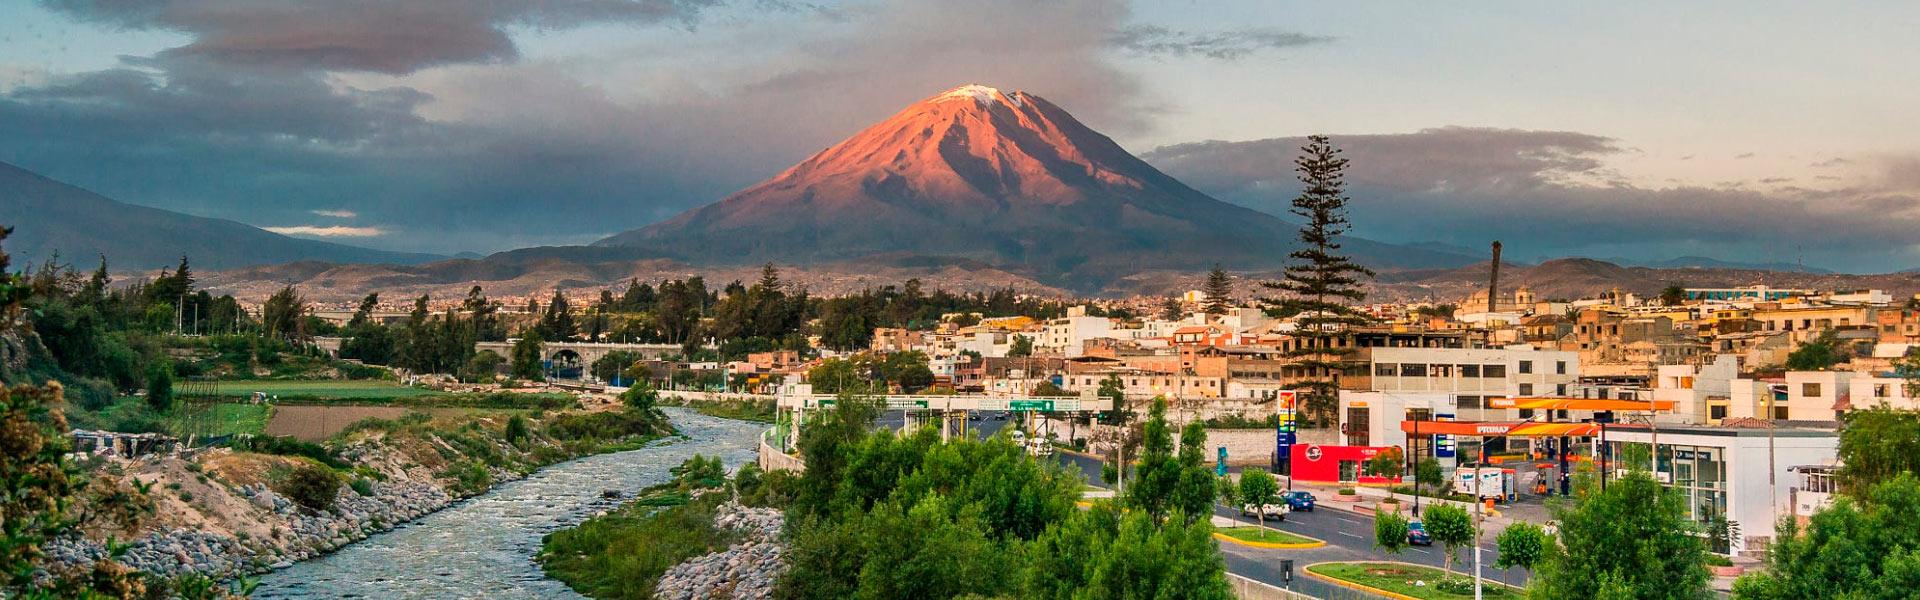 Trekking up to Misti Volcano